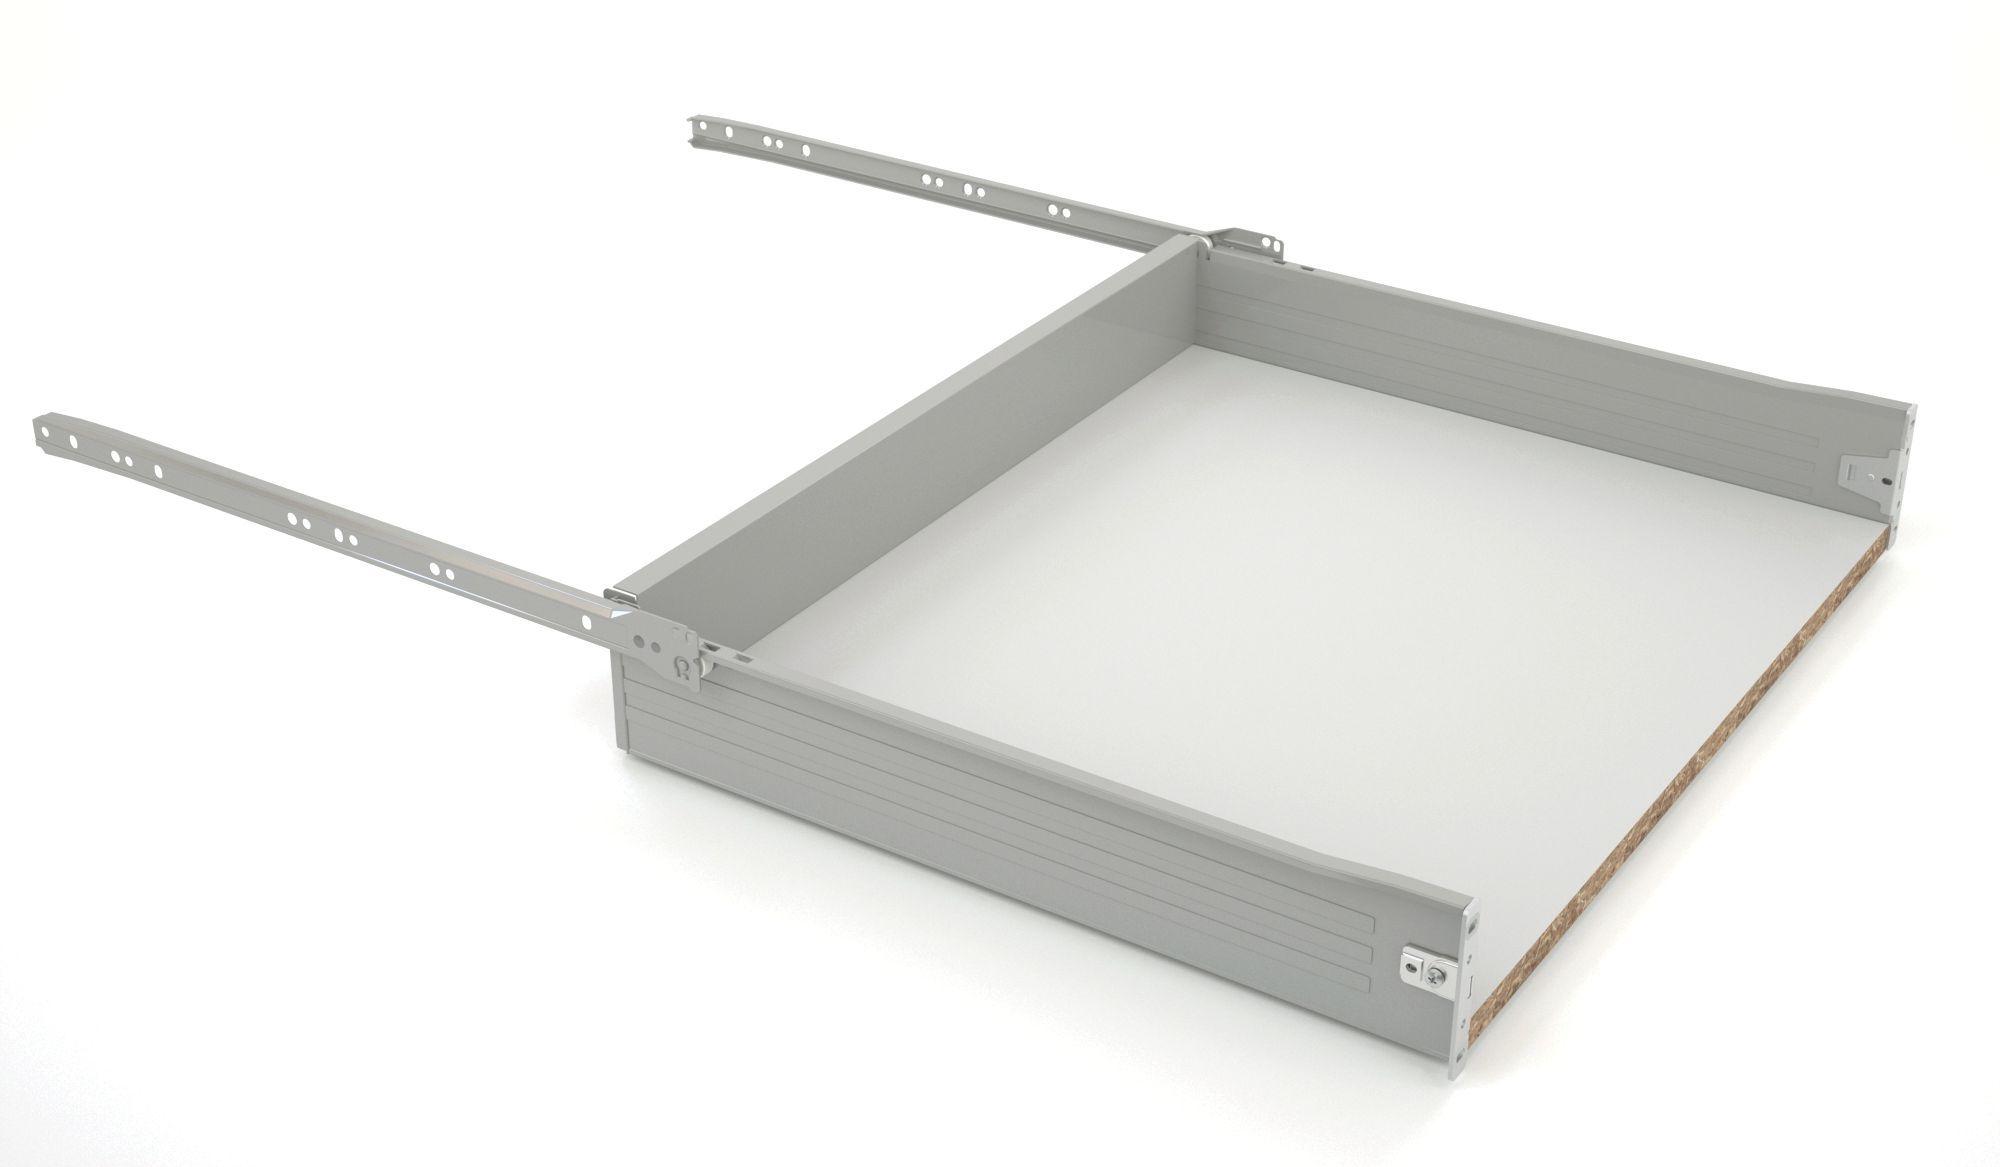 IT Kitchens Standard Drawer Box W 400mm Departments